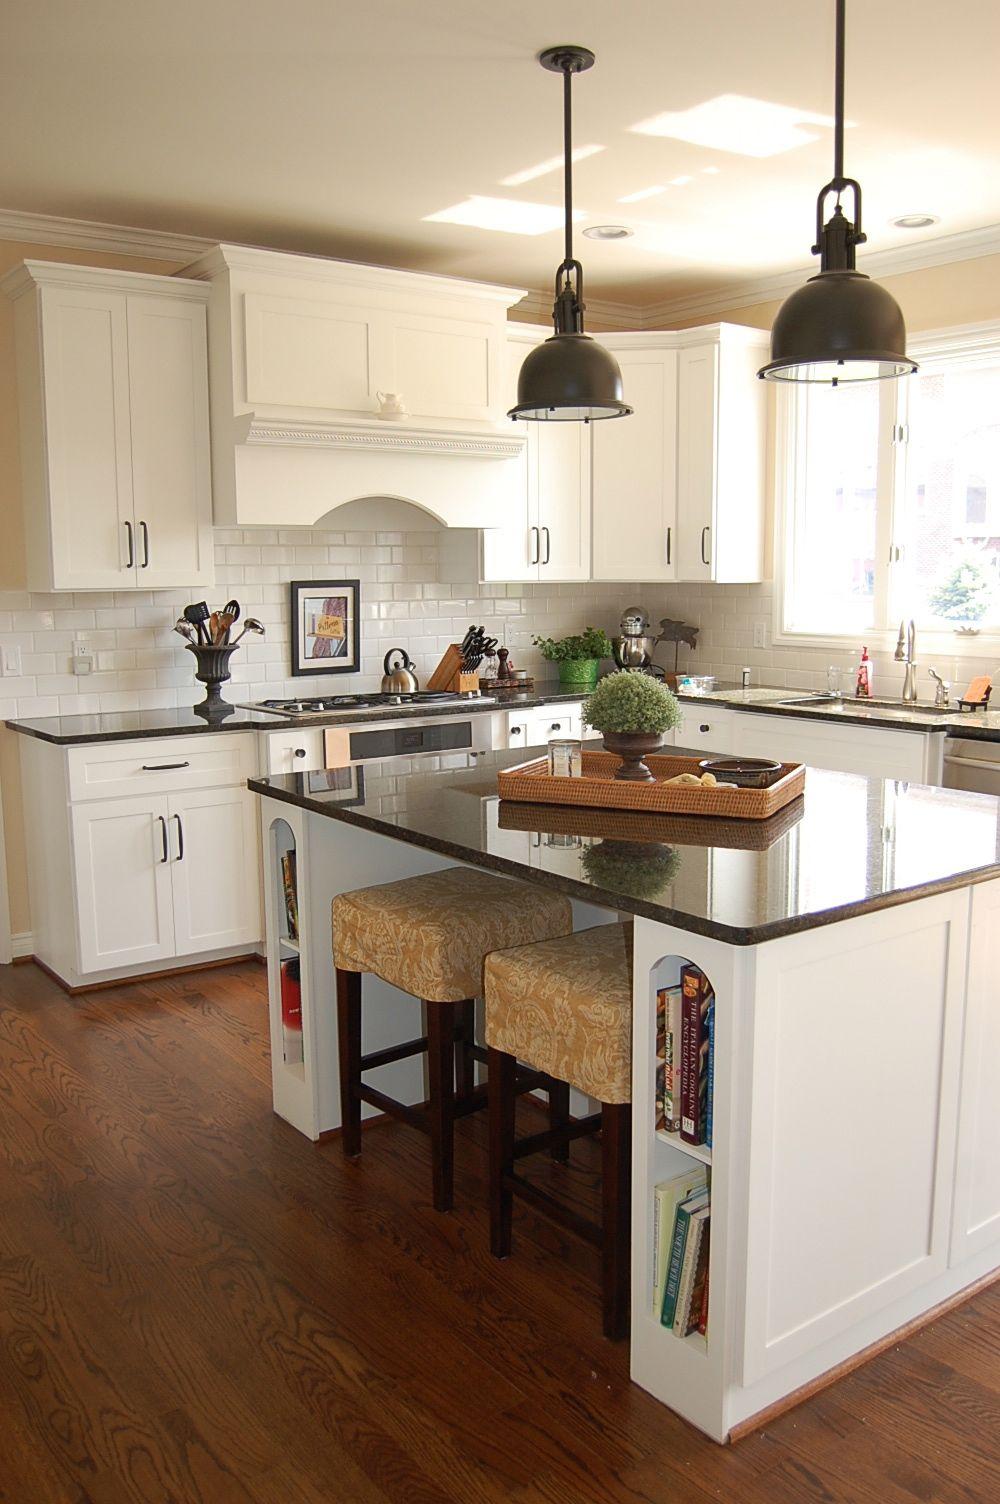 home interiors joanne pintar designer kitchen design kitchen remodel home decor tips on l kitchen interior modern id=56794